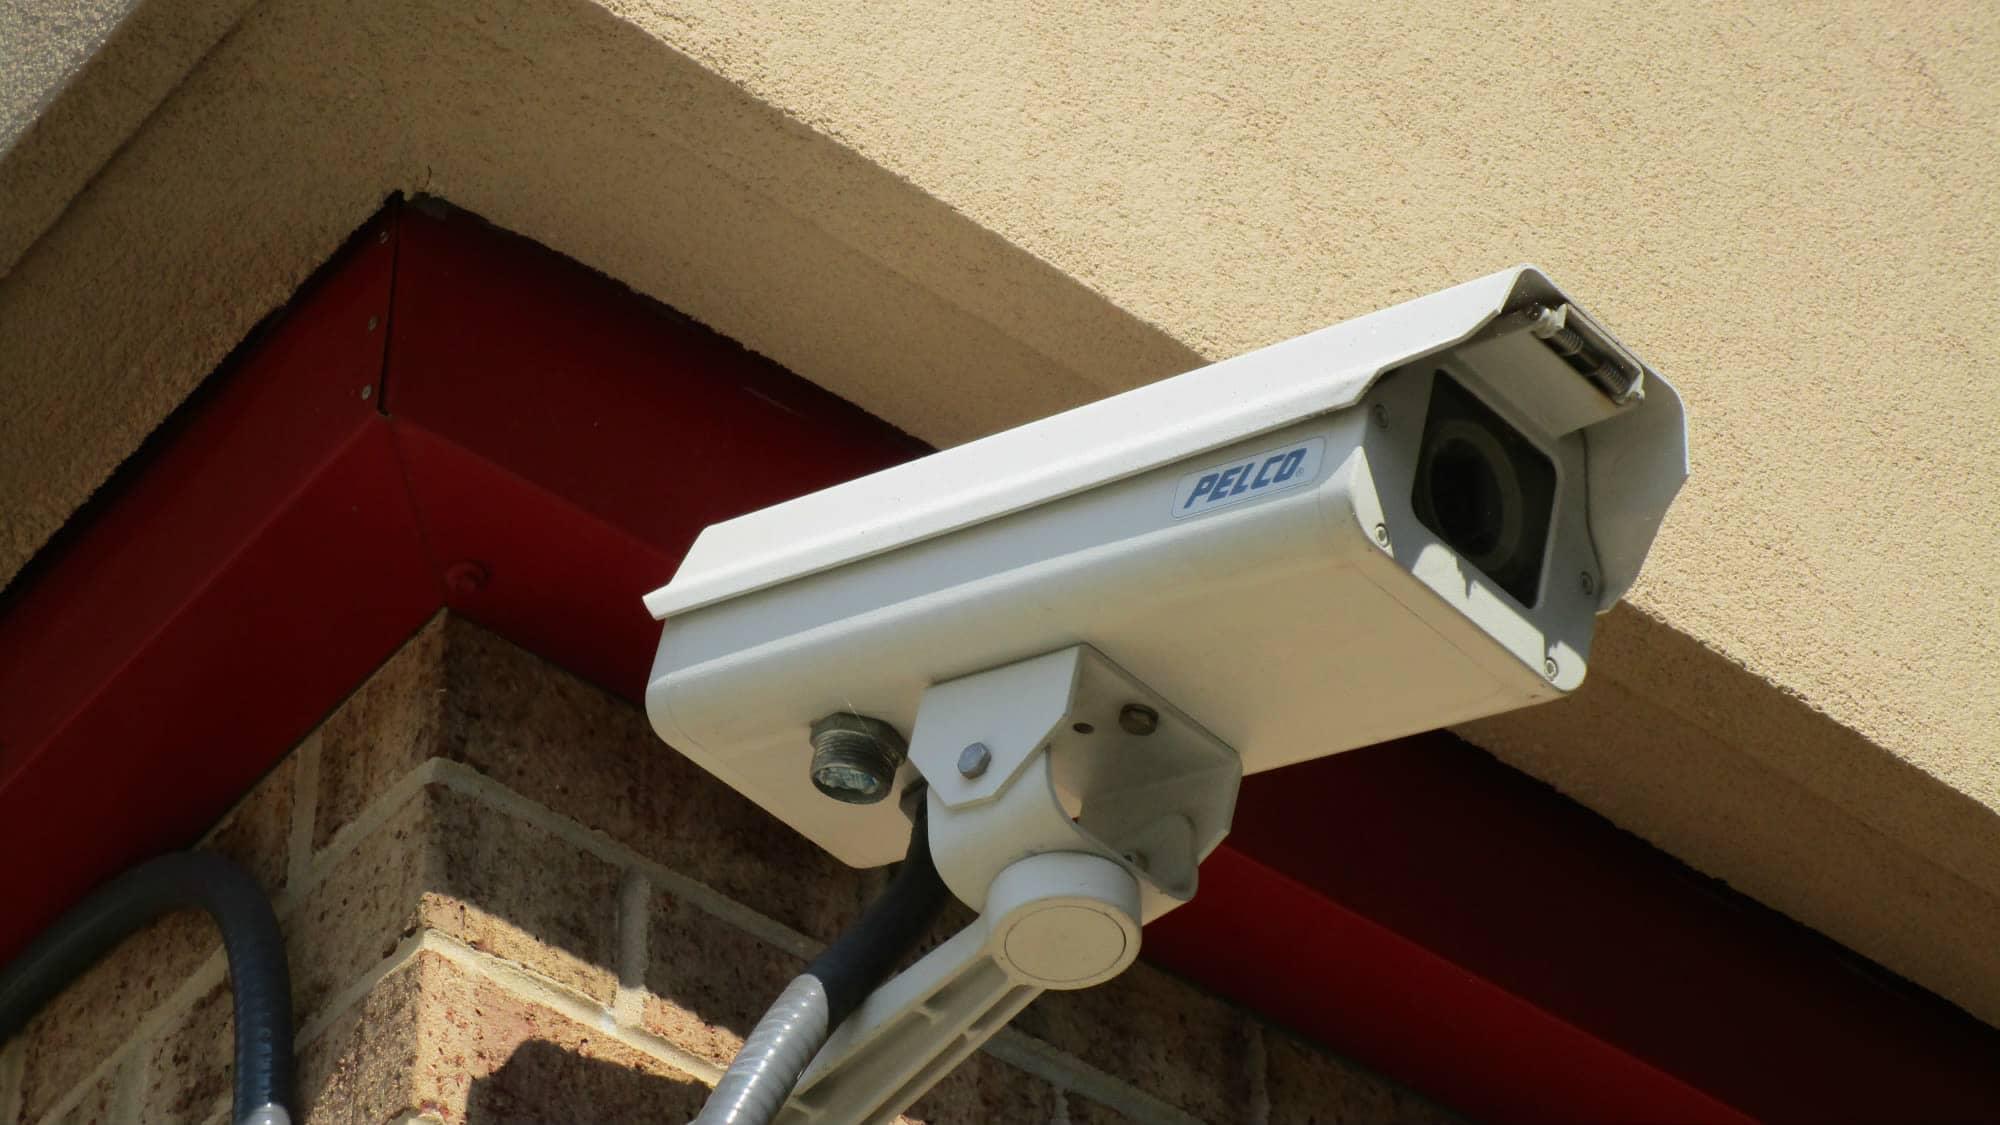 Security camera at Self Storage Plus in Lanham, MD